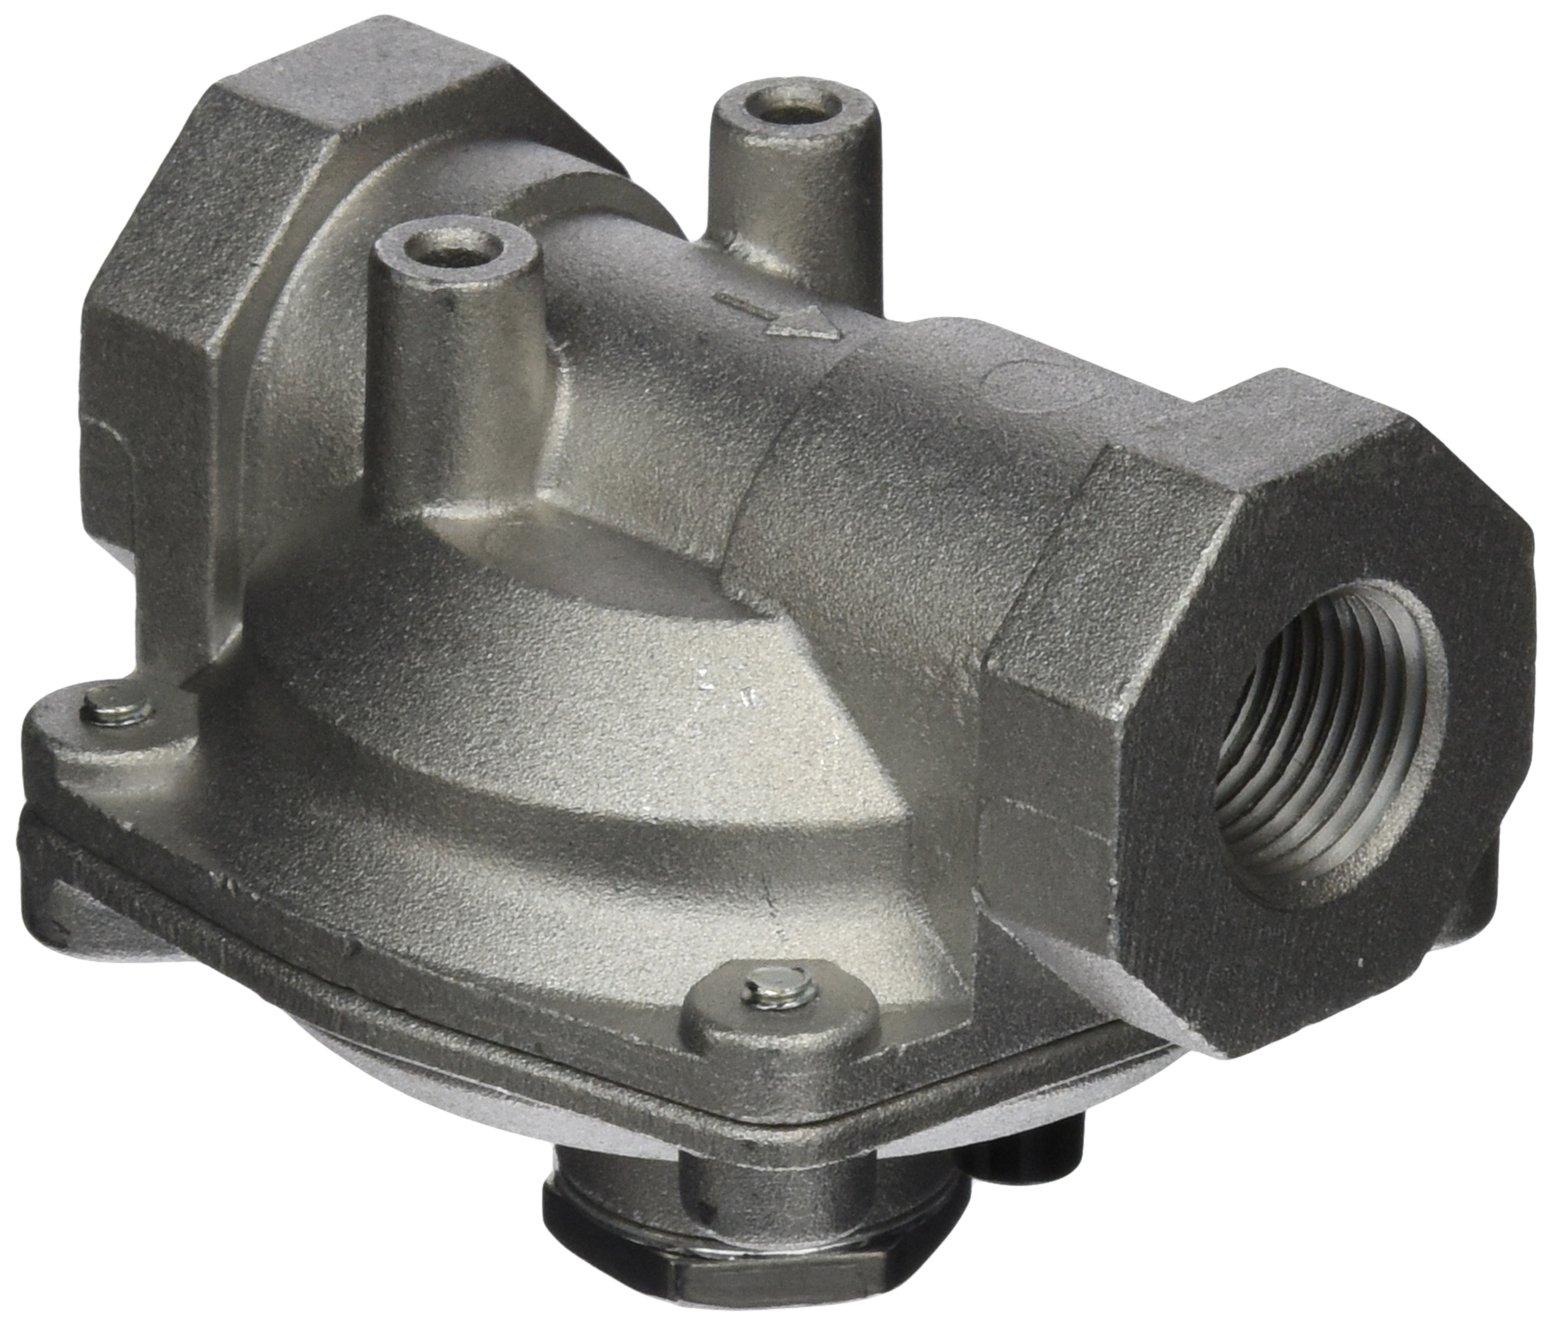 GE WB19T10078 Range/Stove/Oven Pressure Regulator